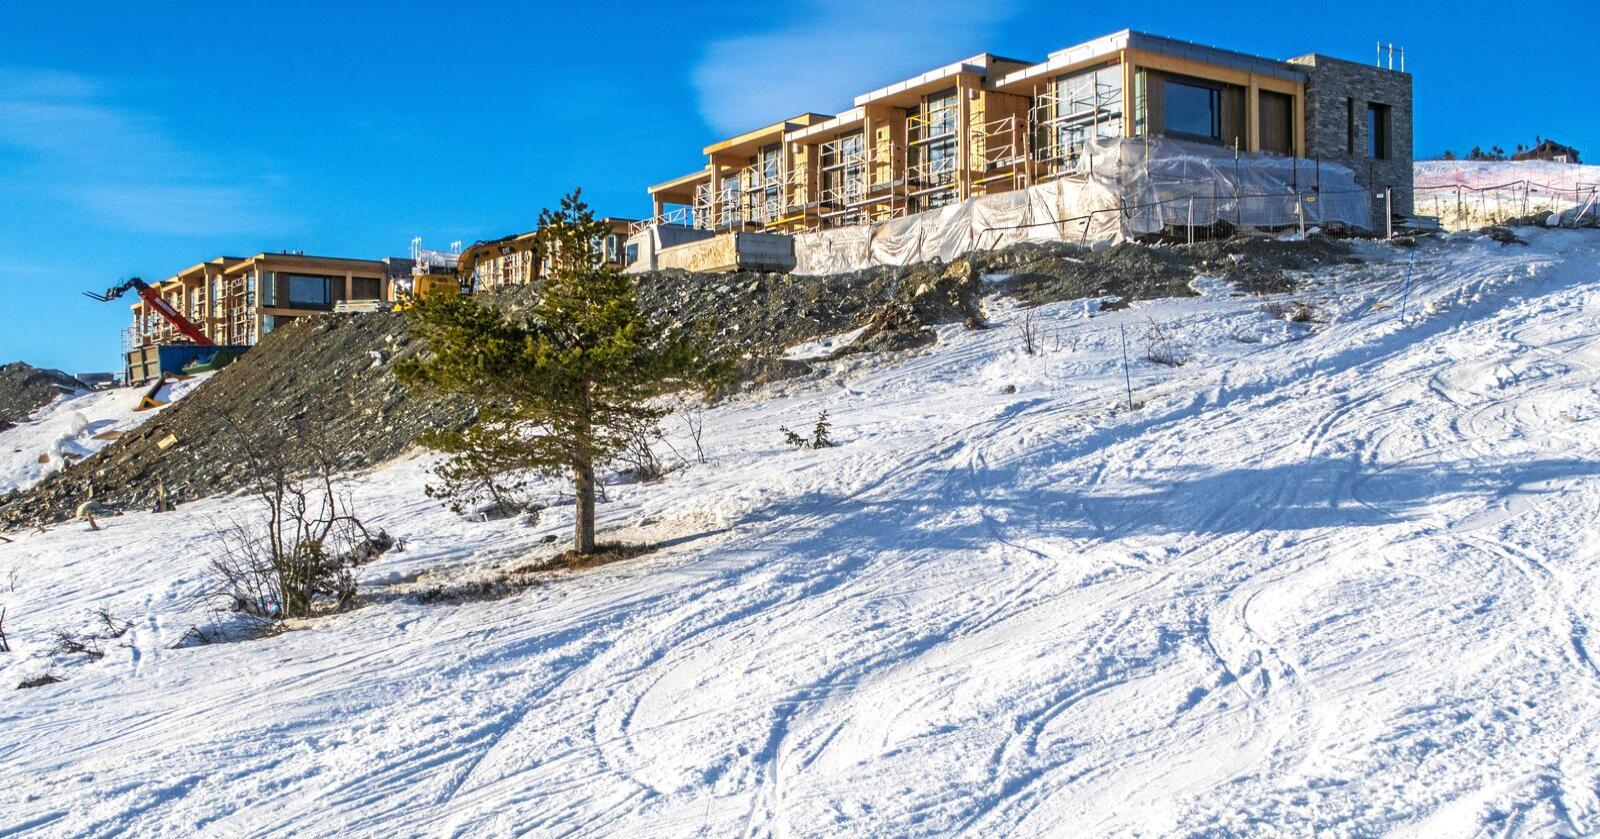 Nye spor: Dagens hytter brukes som bolig. Foto: Halvard Alvik / NTB scanpix